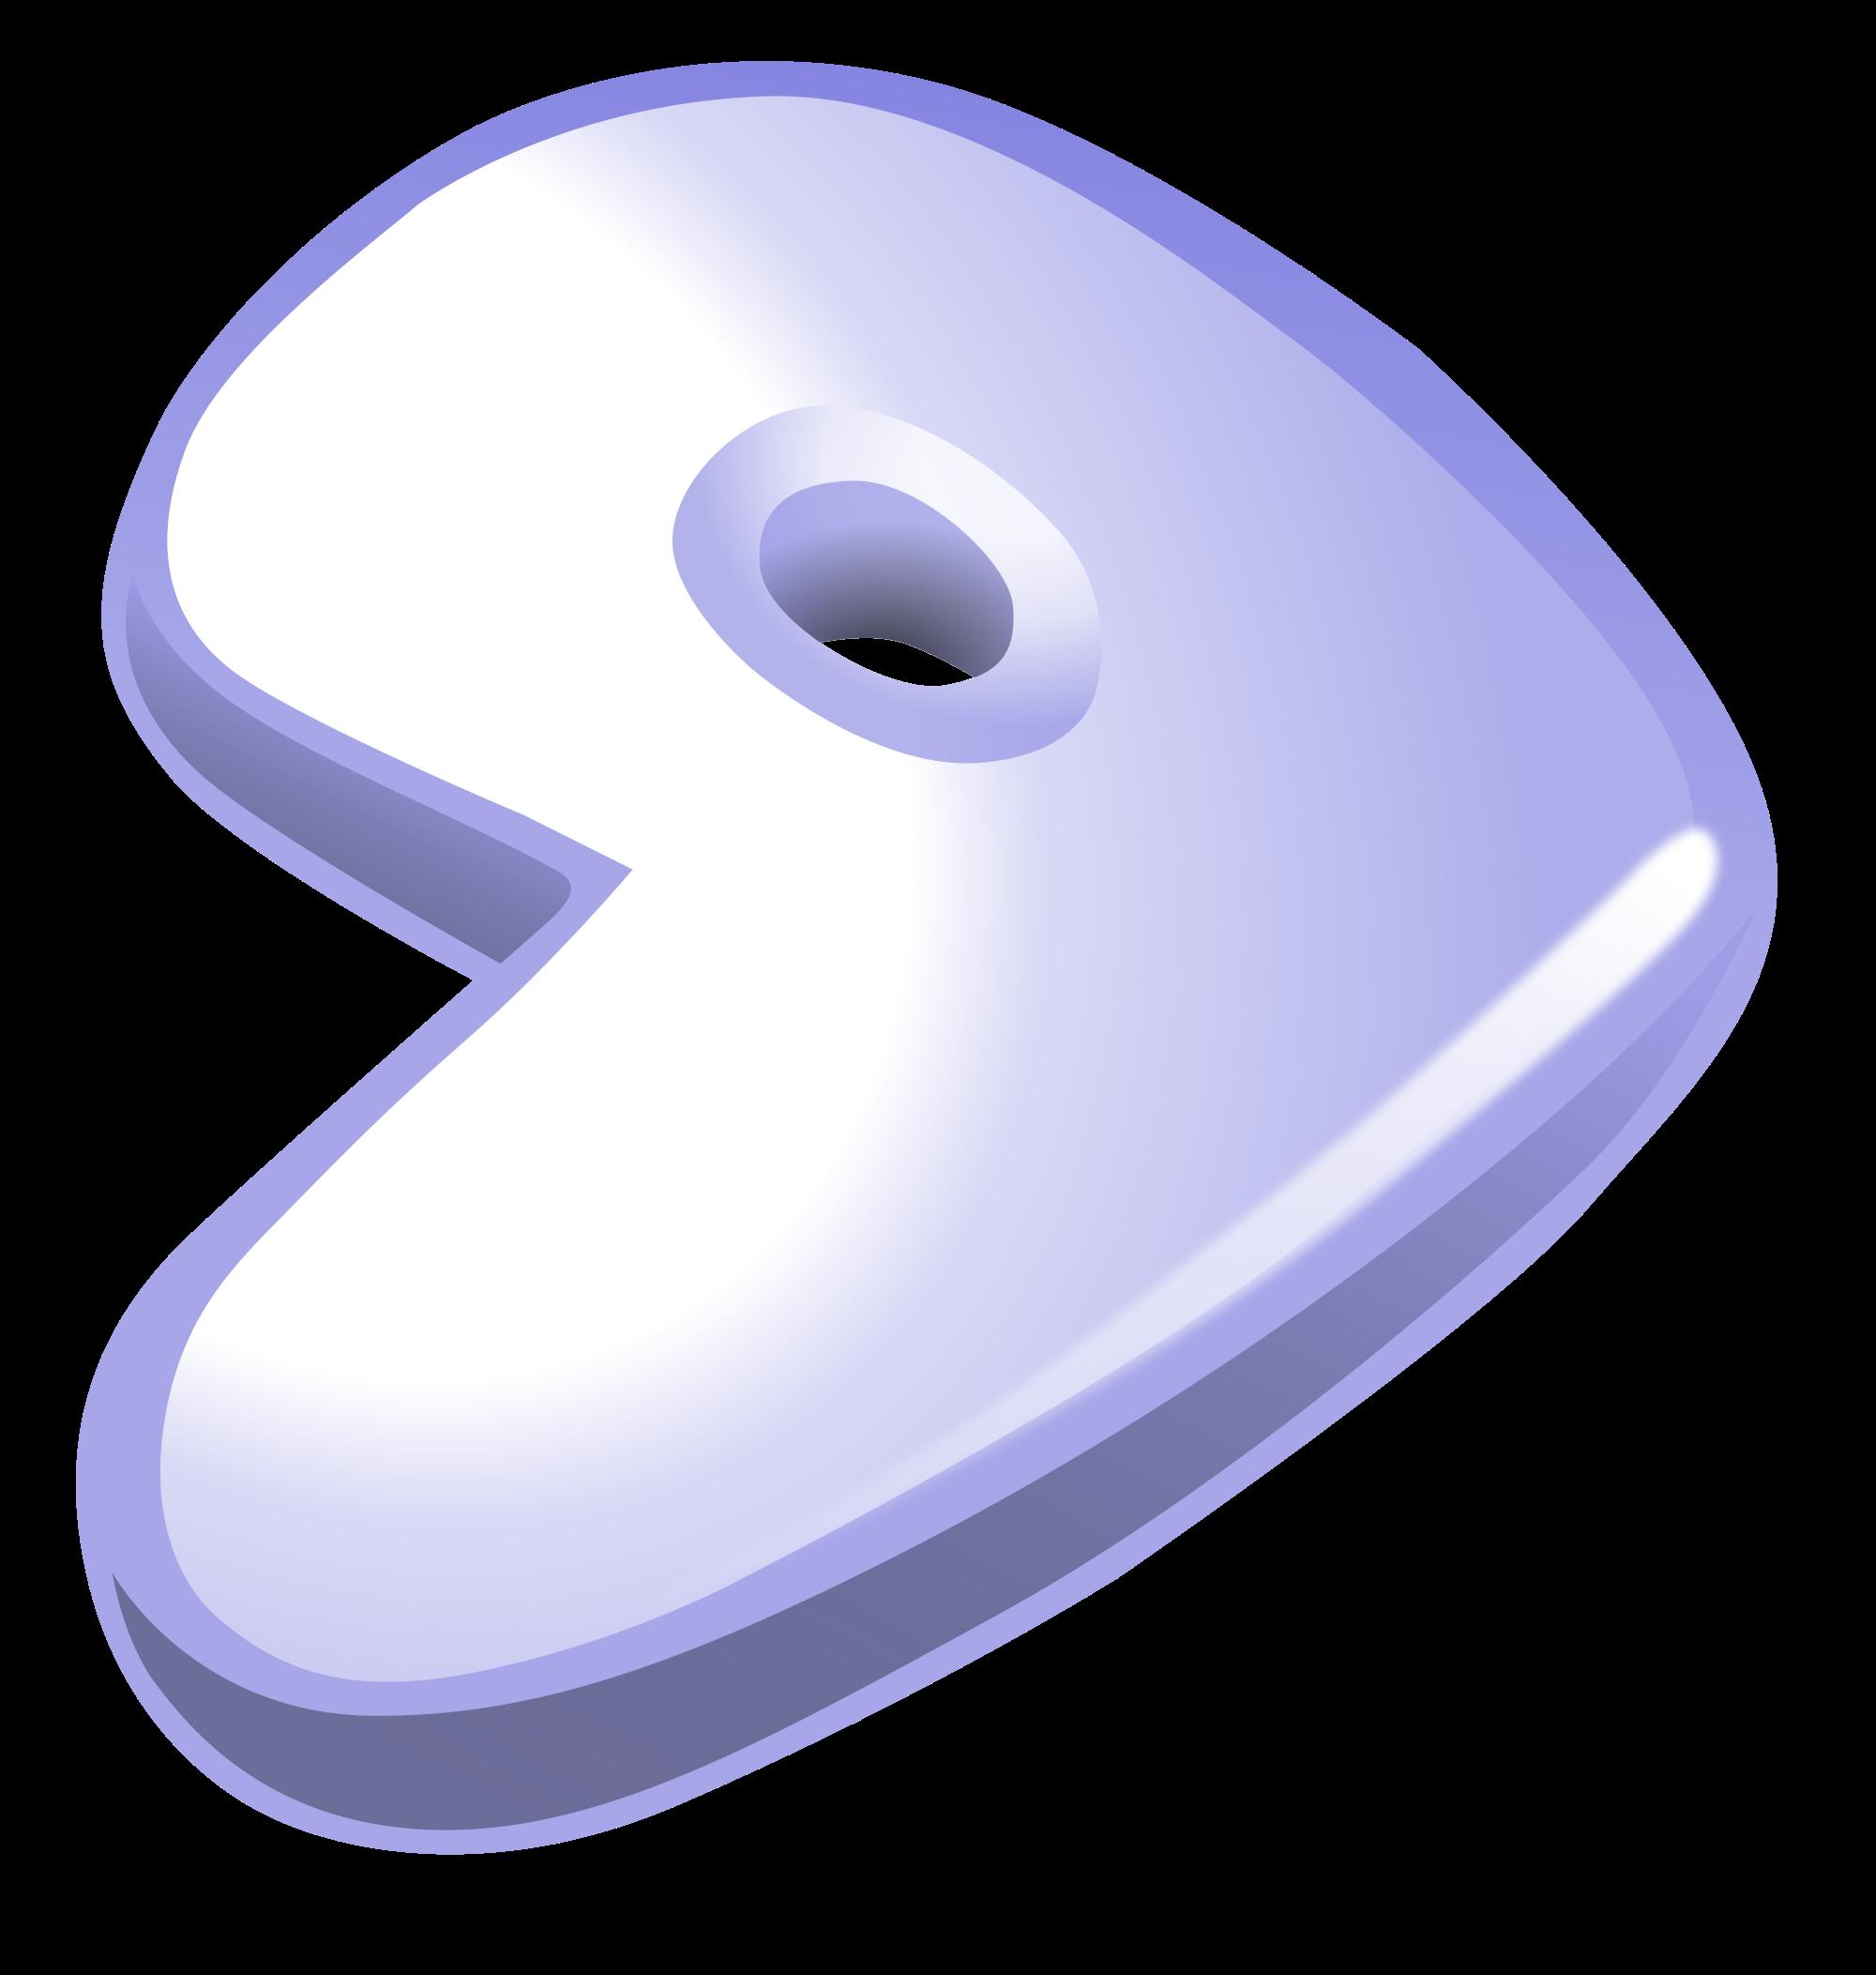 File gentoo logo plain. Peach clipart svg